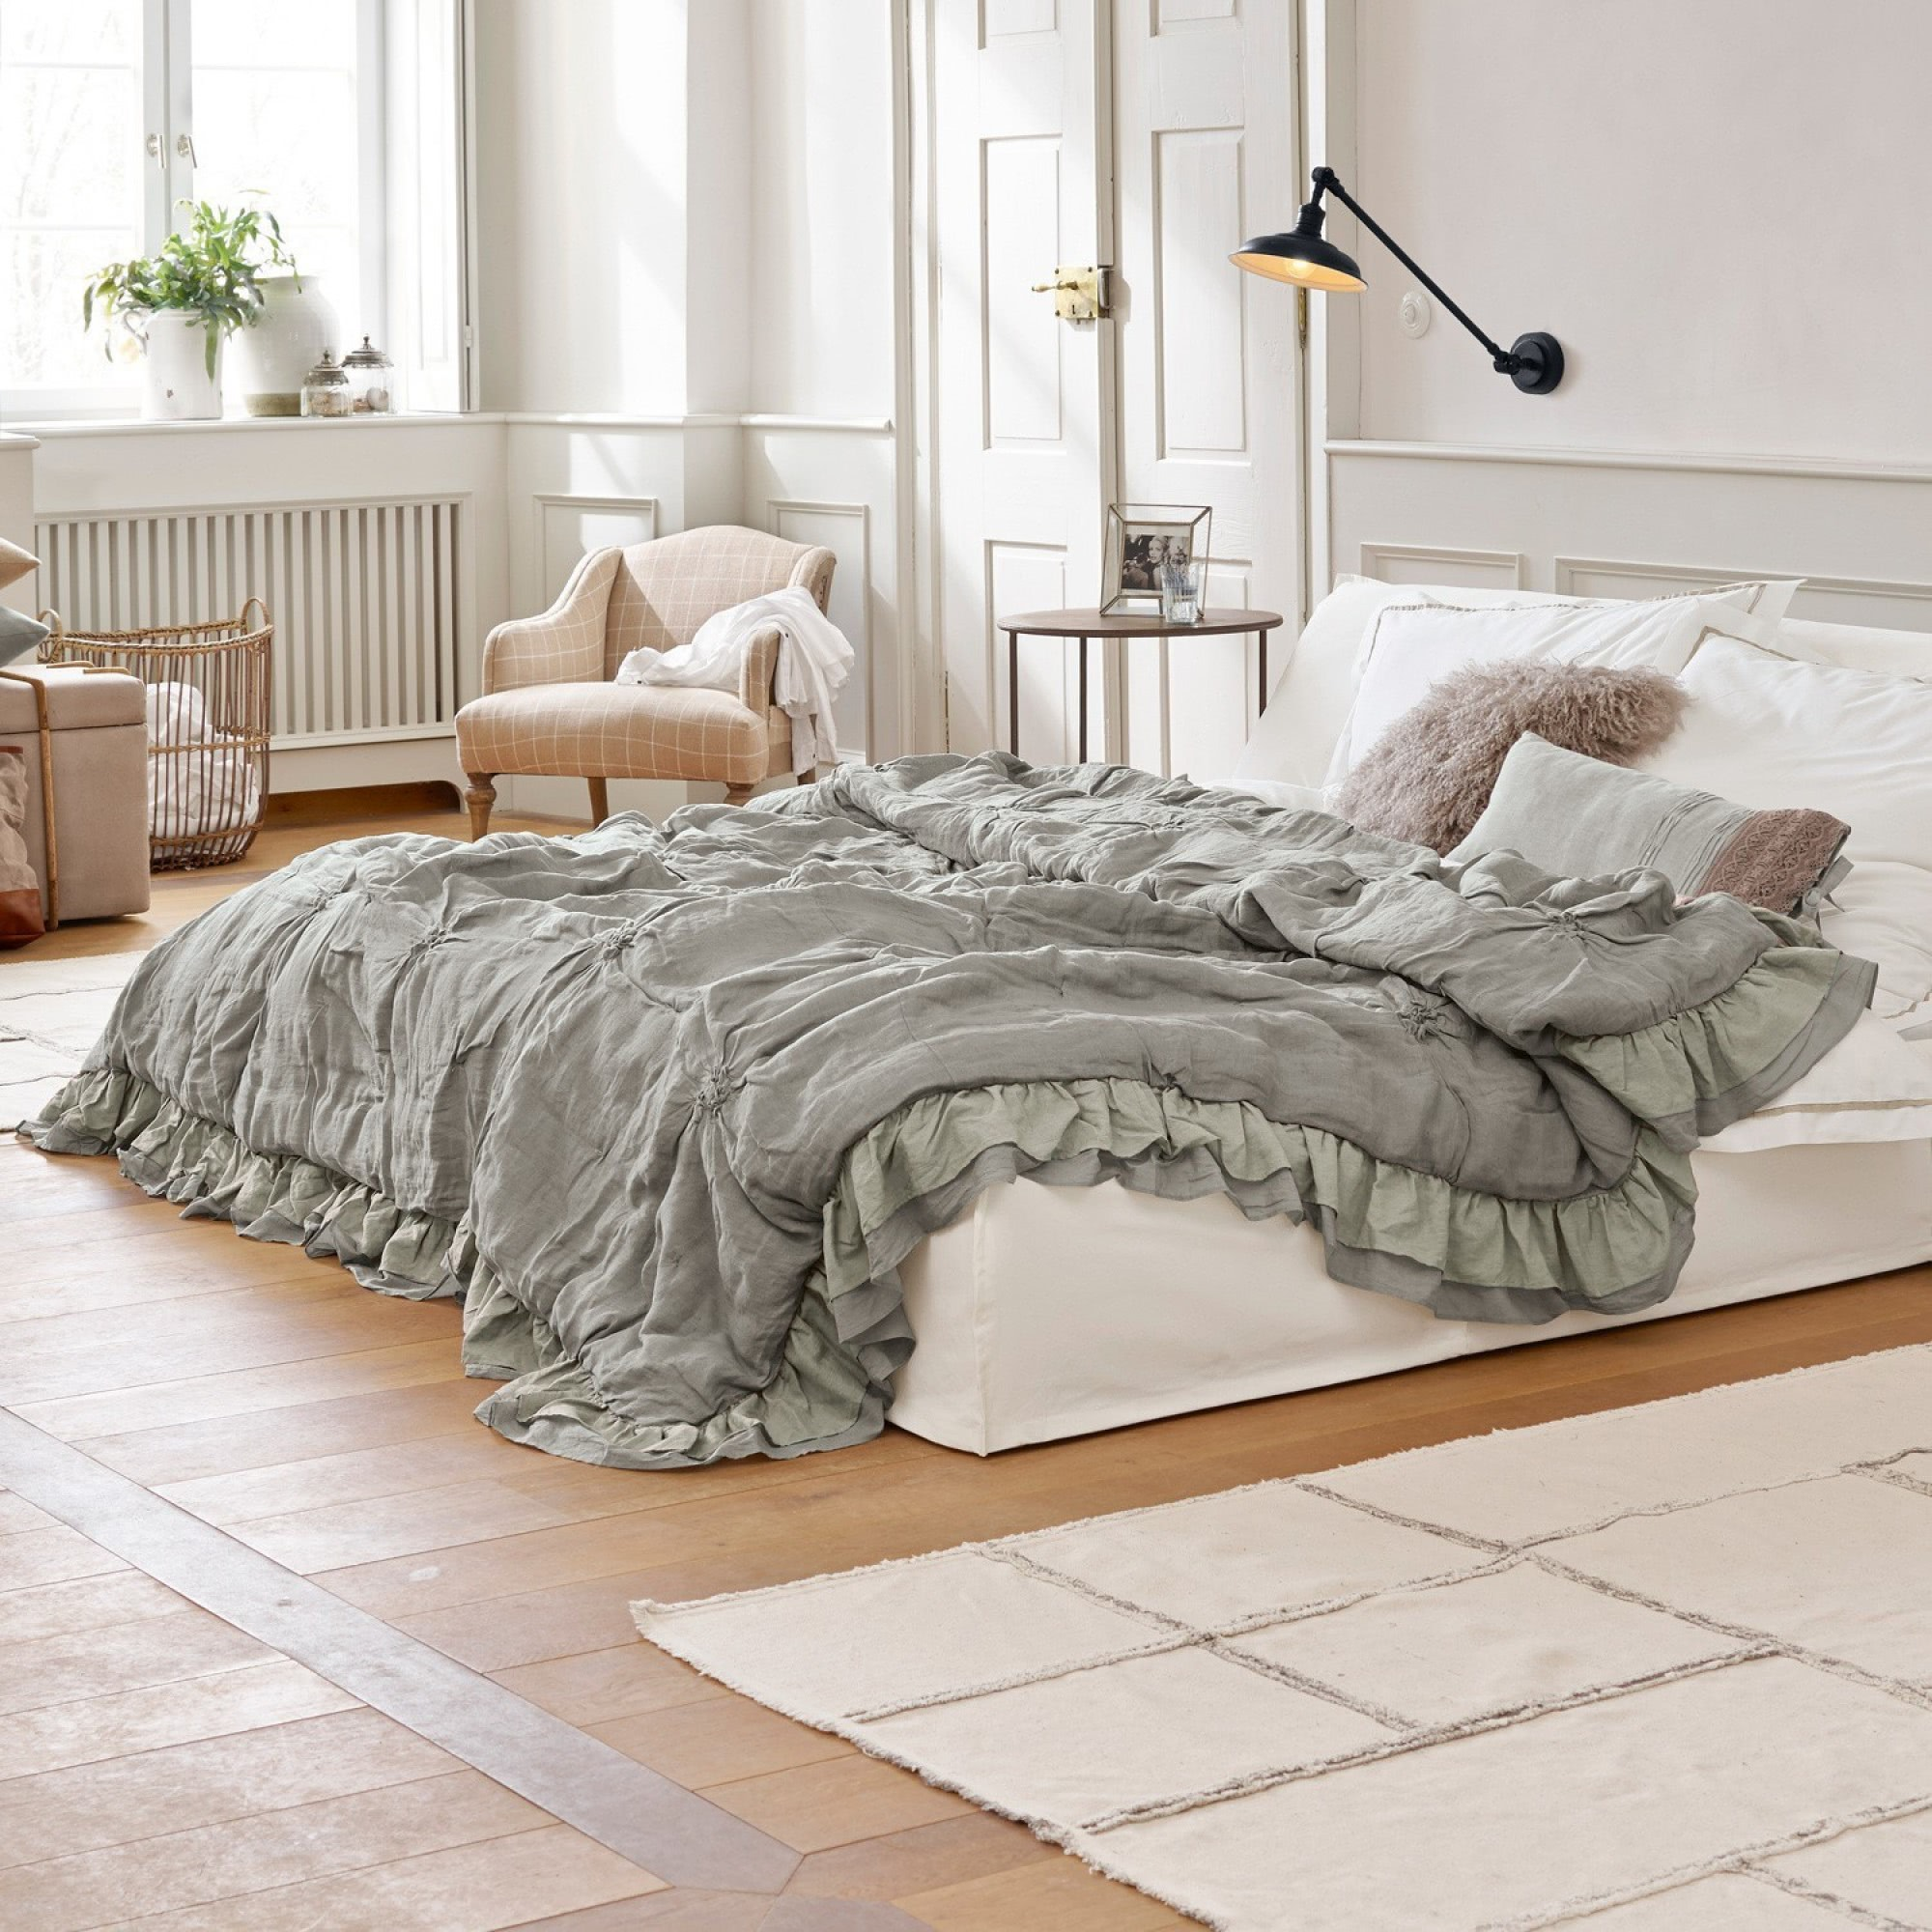 quilt millis loberon coming home. Black Bedroom Furniture Sets. Home Design Ideas